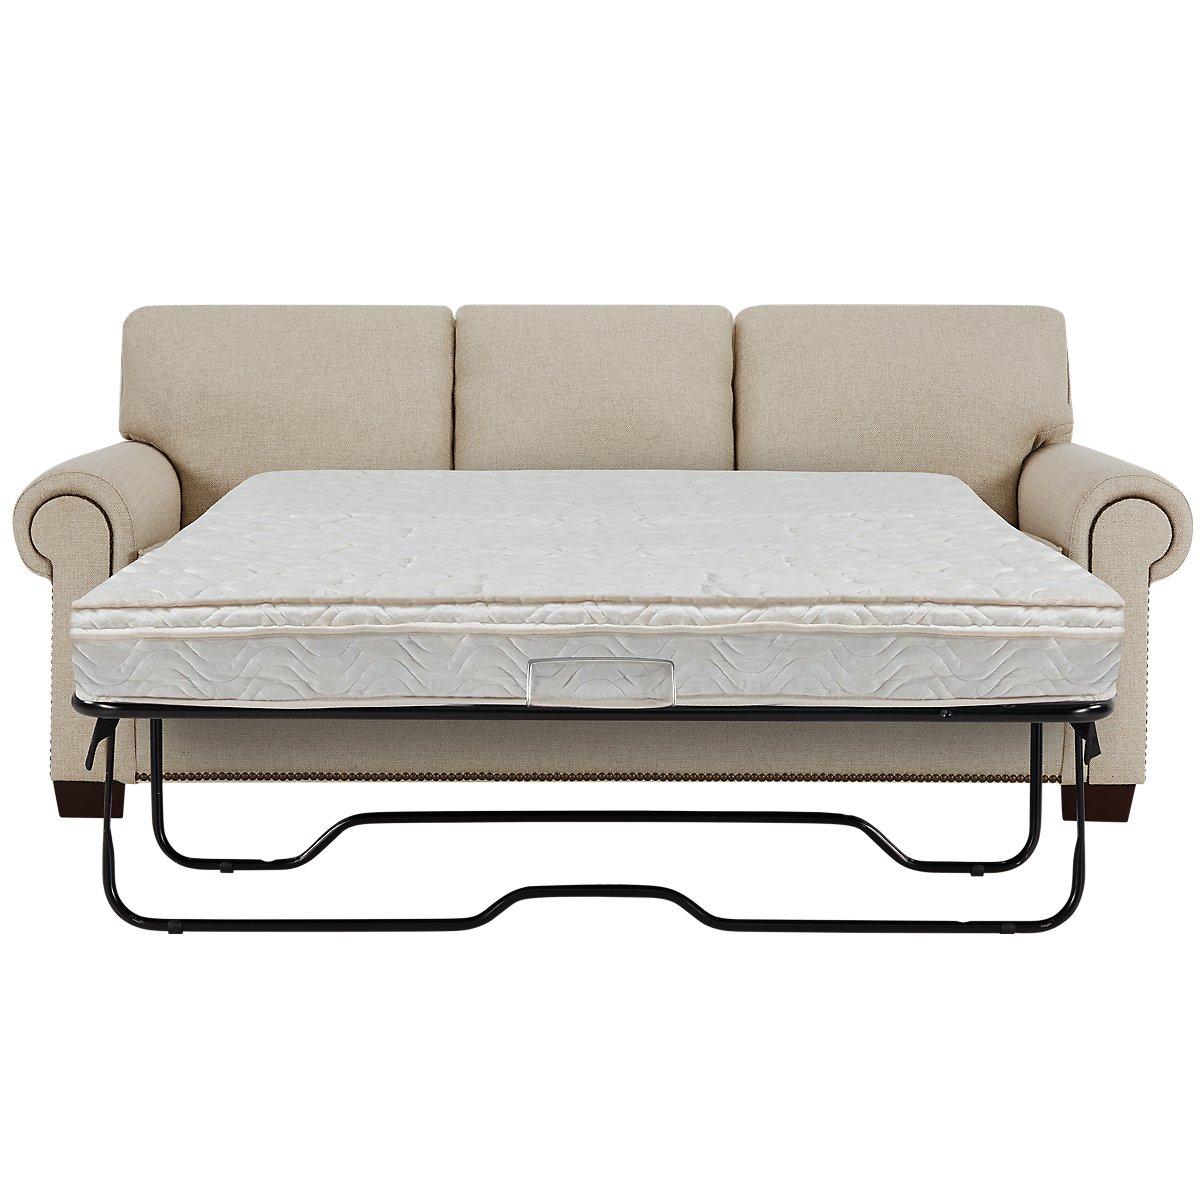 City Furniture Foster Khaki Fabric Innerspring Sleeper